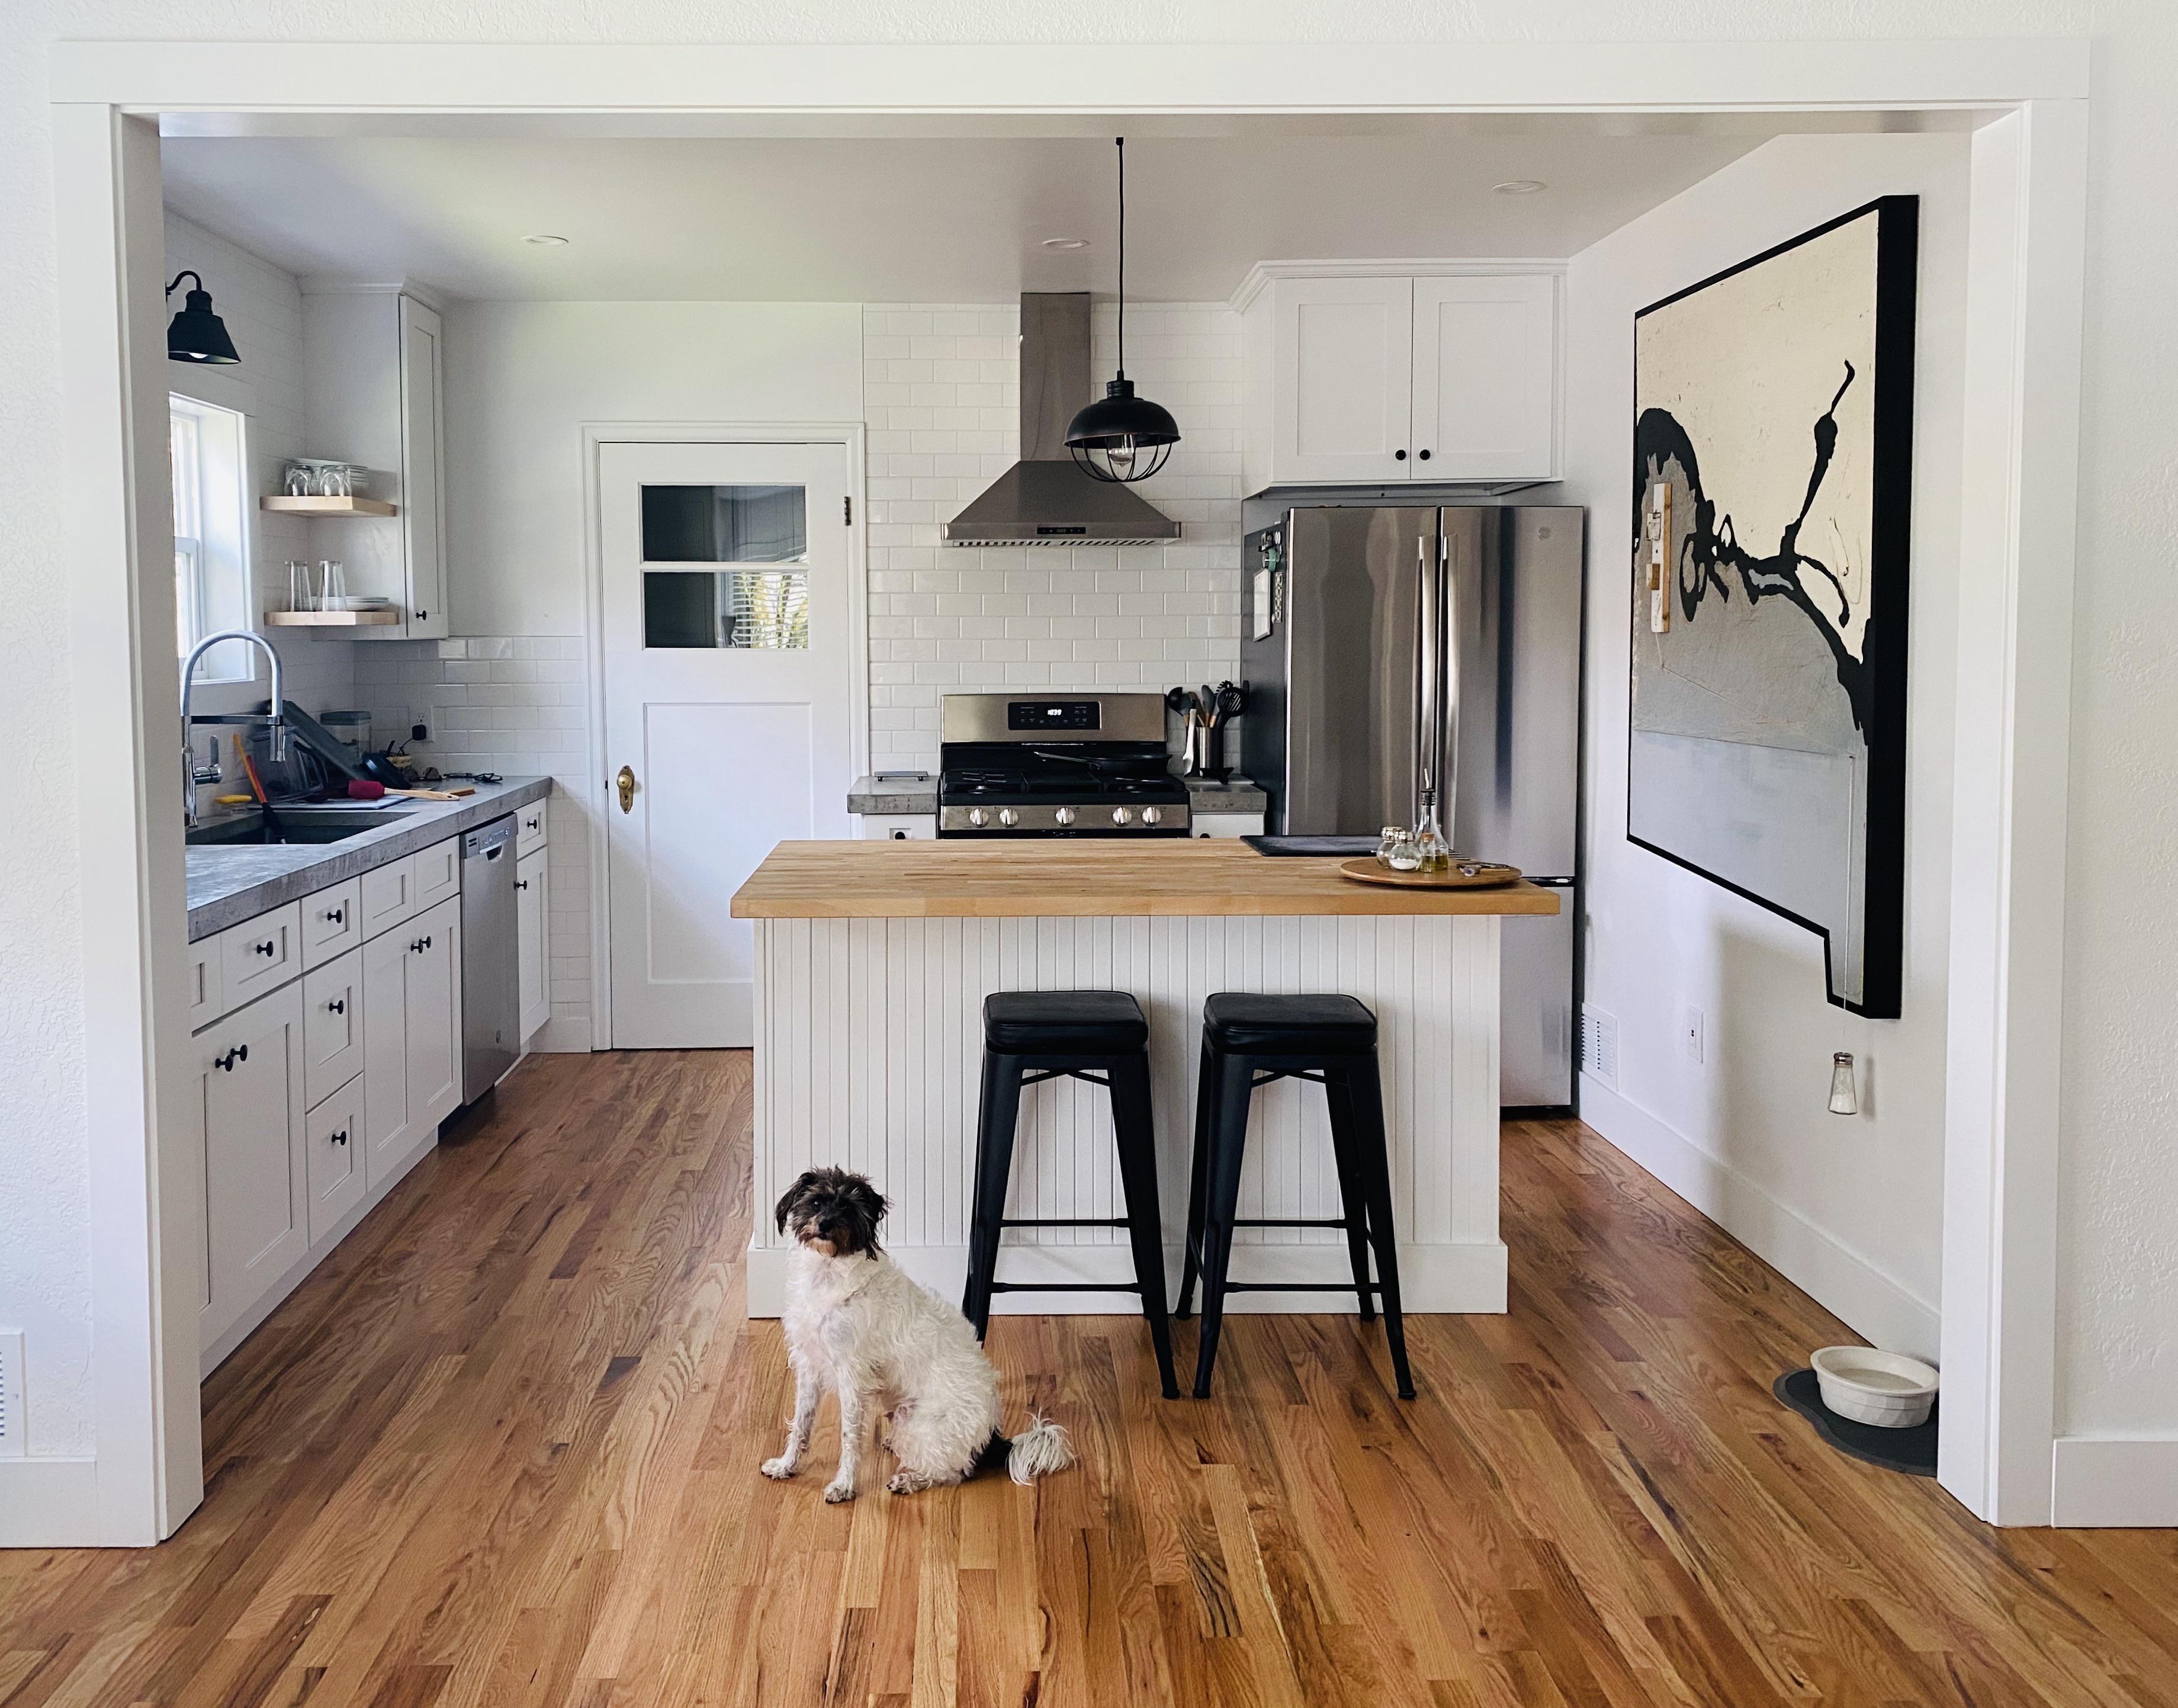 Our Kitchen Salem Oregon Home Homedesigns Design Homeideas Roomideas Room Rooms In 2020 Creative Kitchen Backsplash Glass Kitchen Cabinet Doors Kitchen Themes